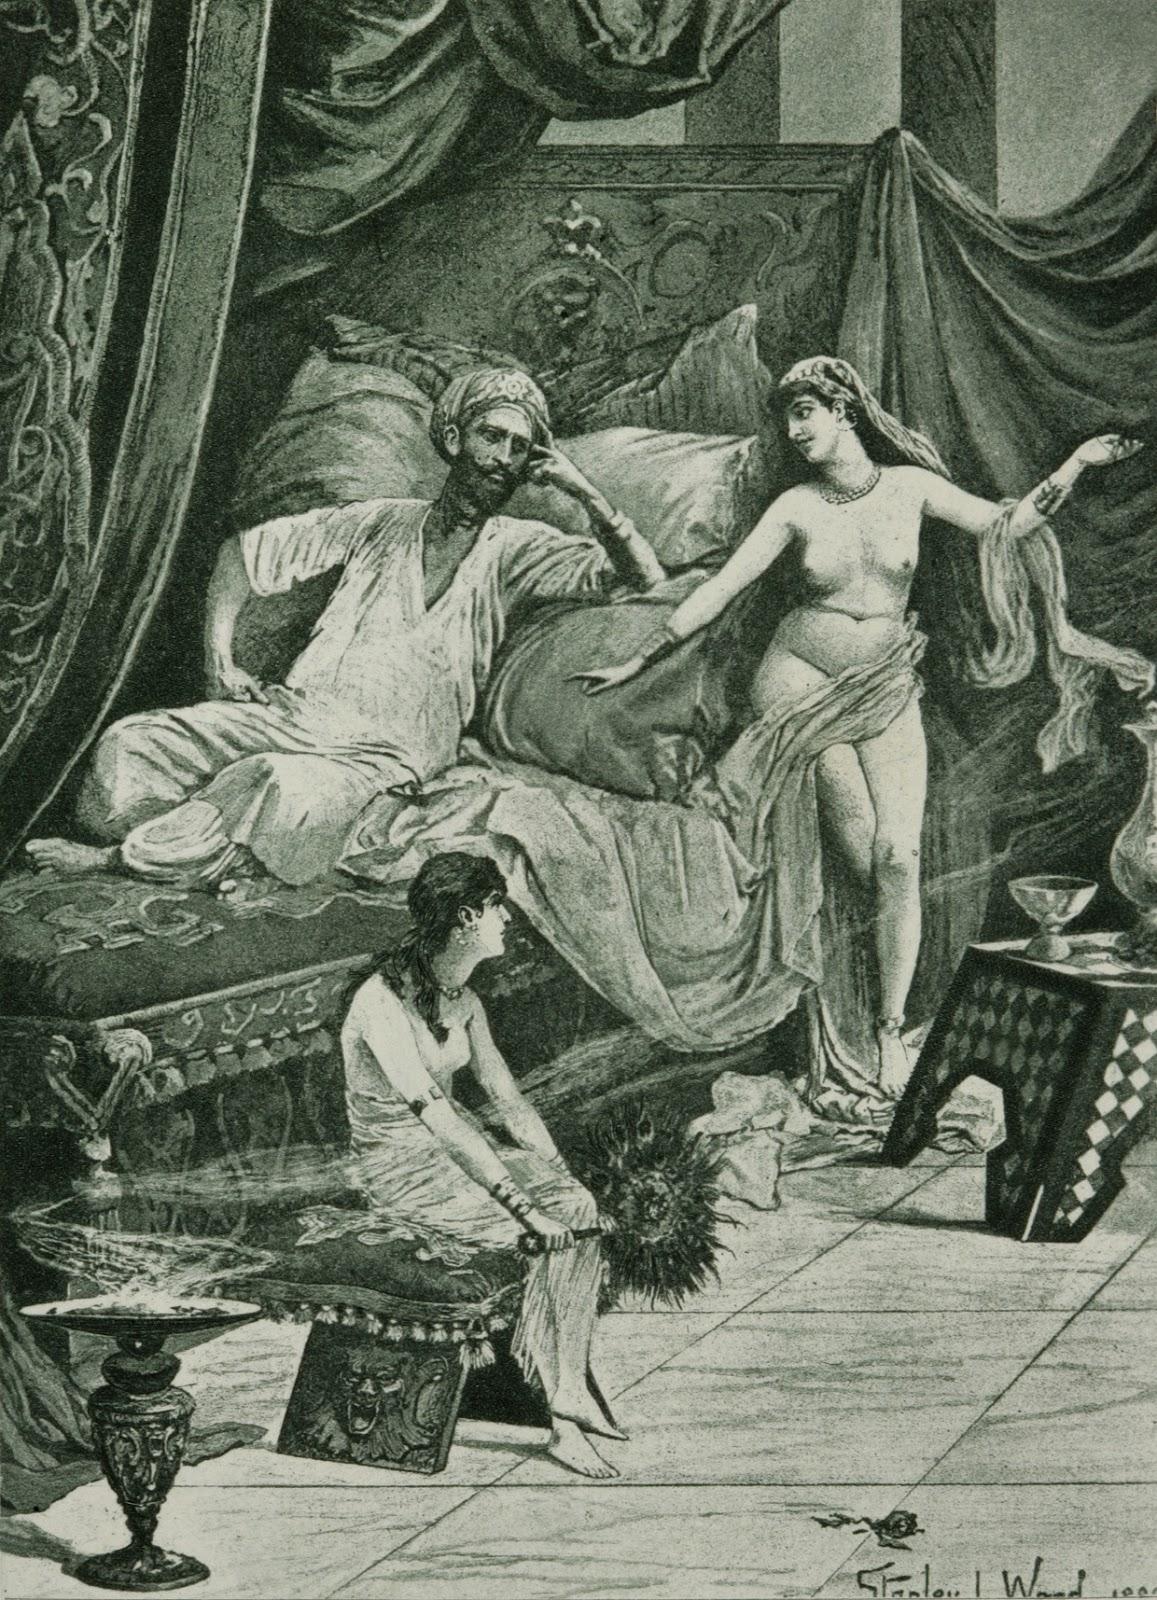 Scheherazade tales